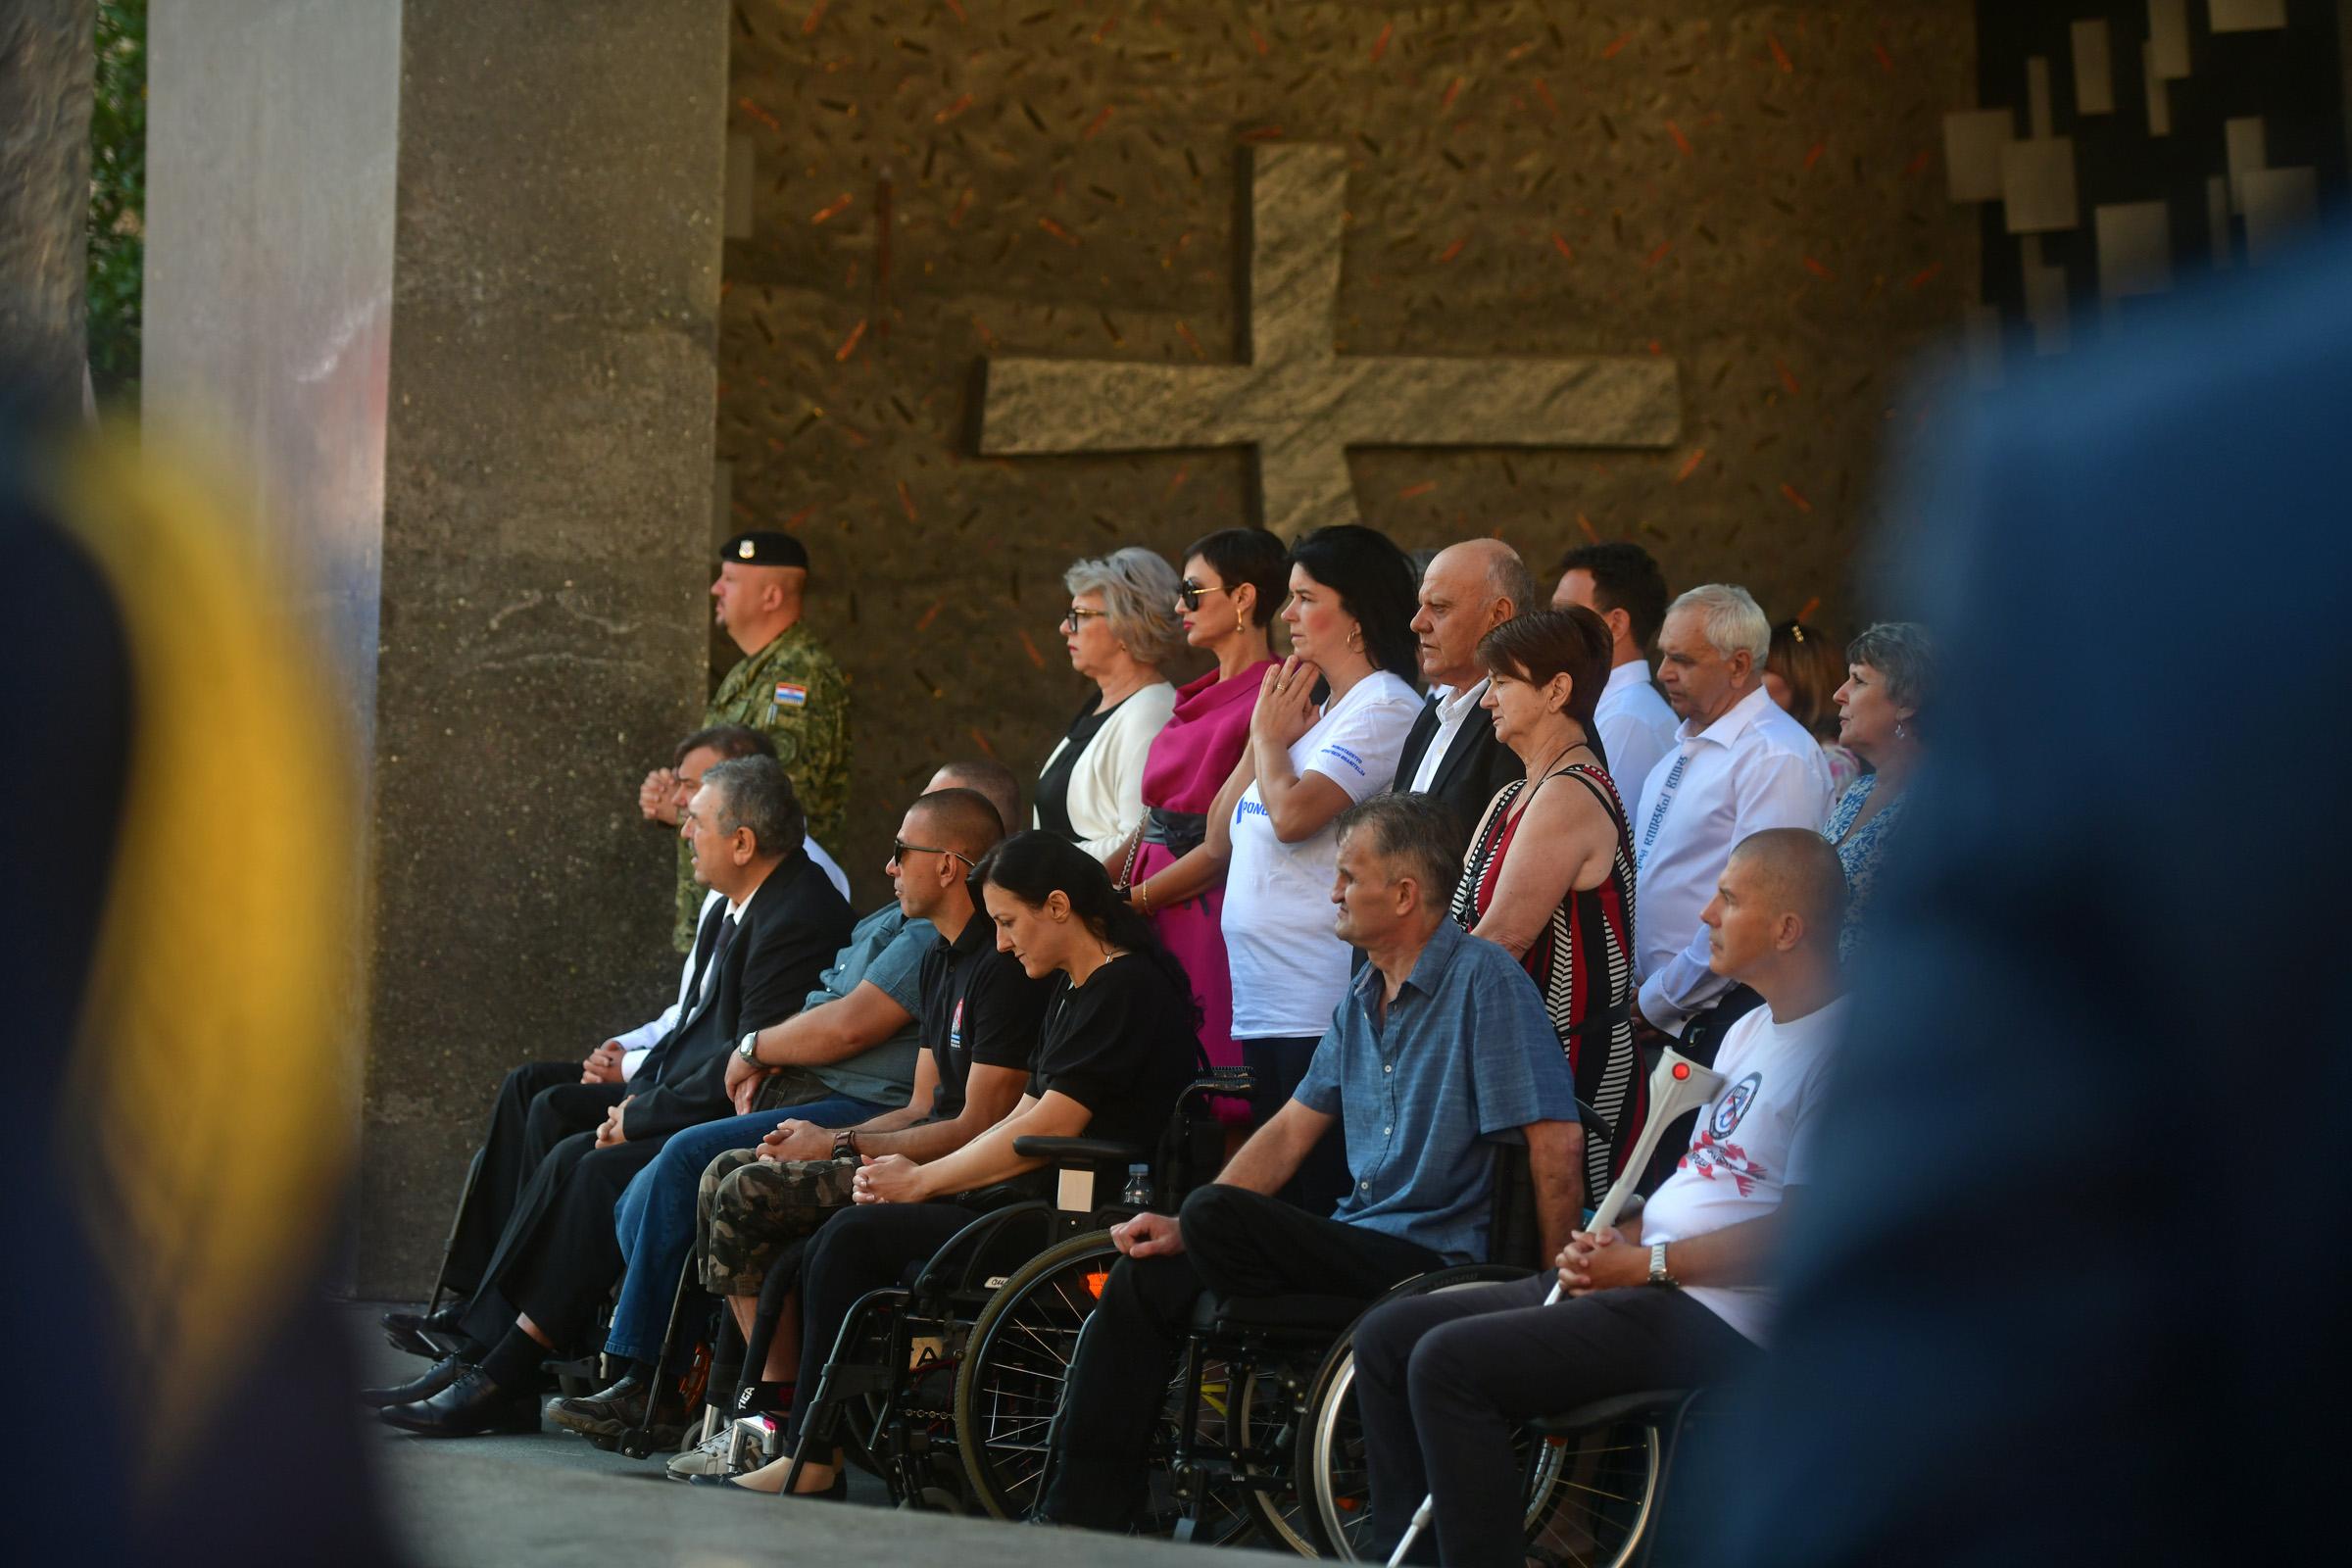 Obilježena 24. obljetnica vojno-redarstvene operacije Oluja